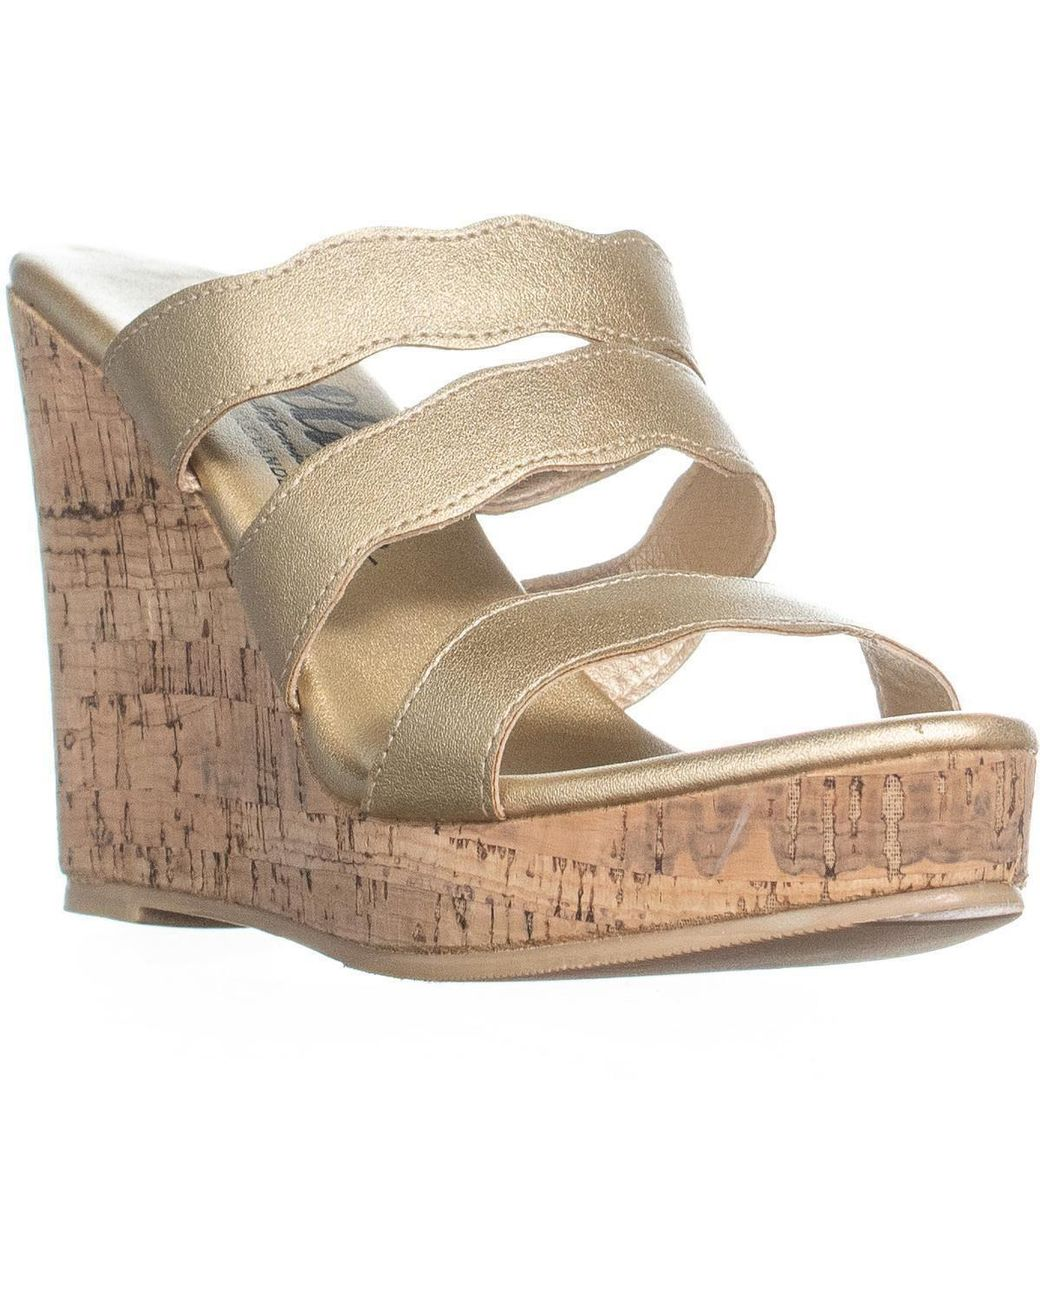 7734c0a7524a Lyst - Callisto Flure Triple Strap Wedge Sandals in Metallic - Save 60%